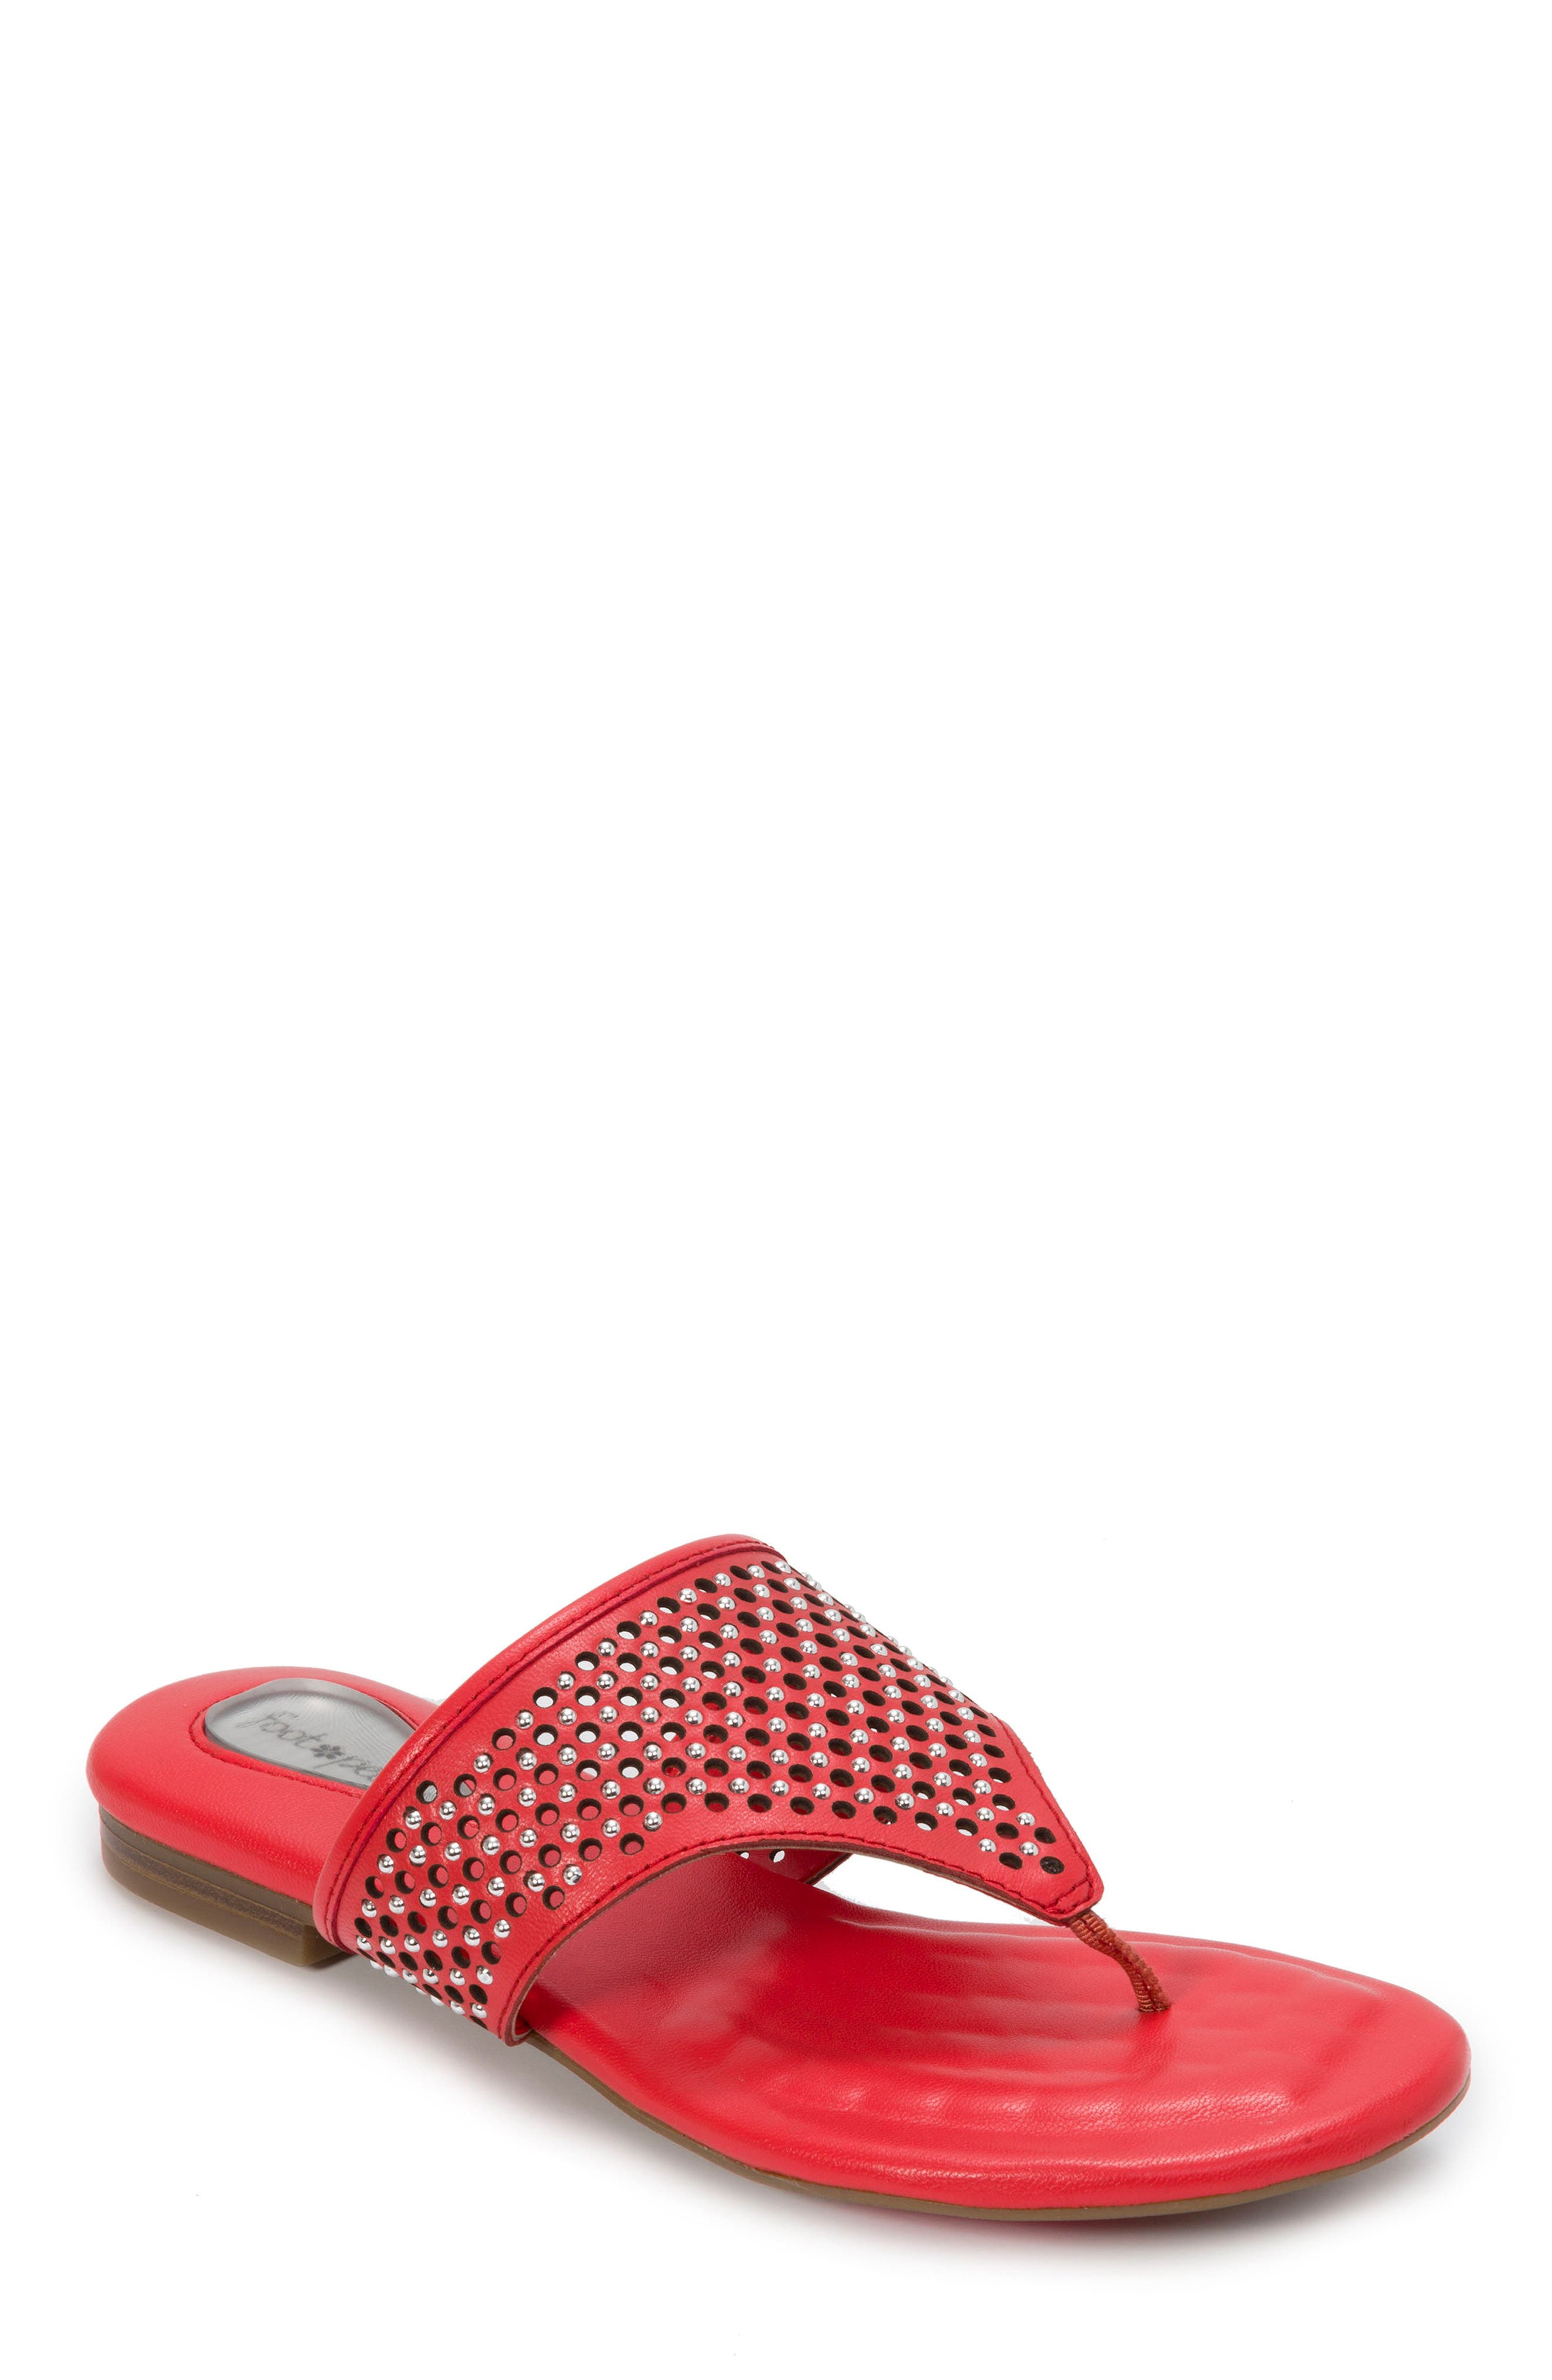 Foot Petals Evie Sandal, Red